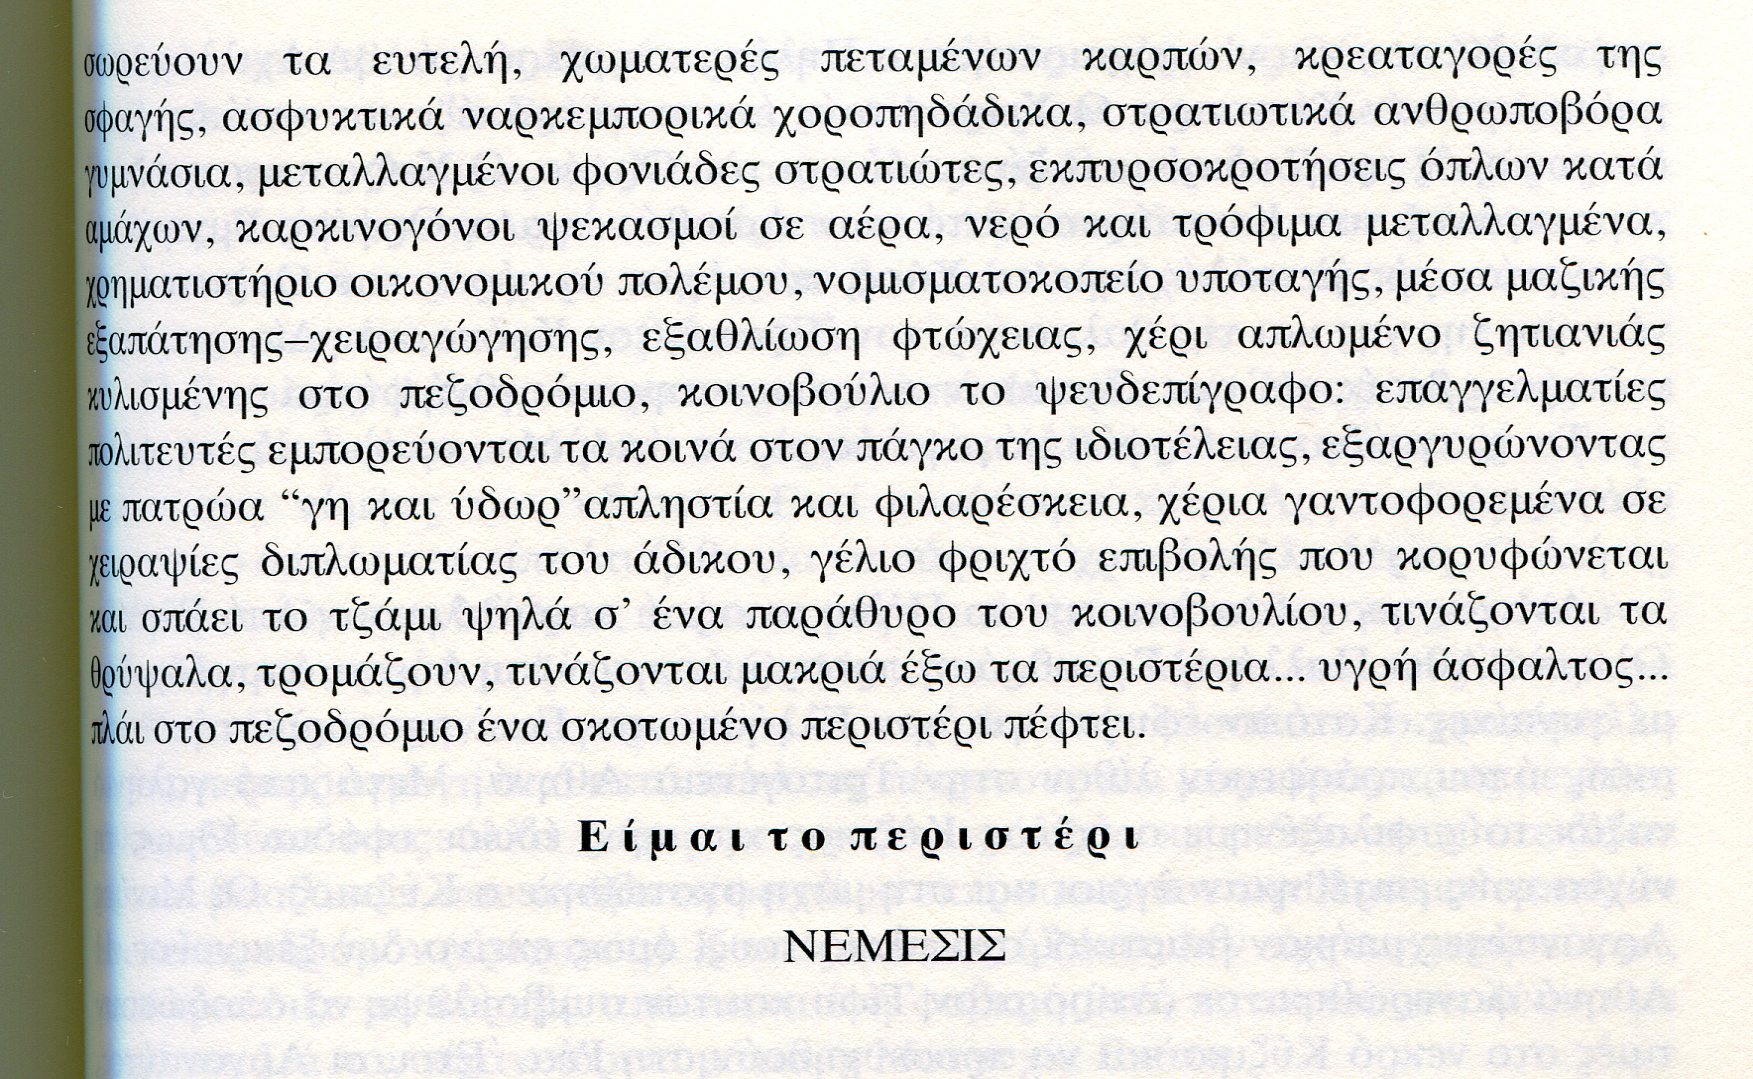 img369